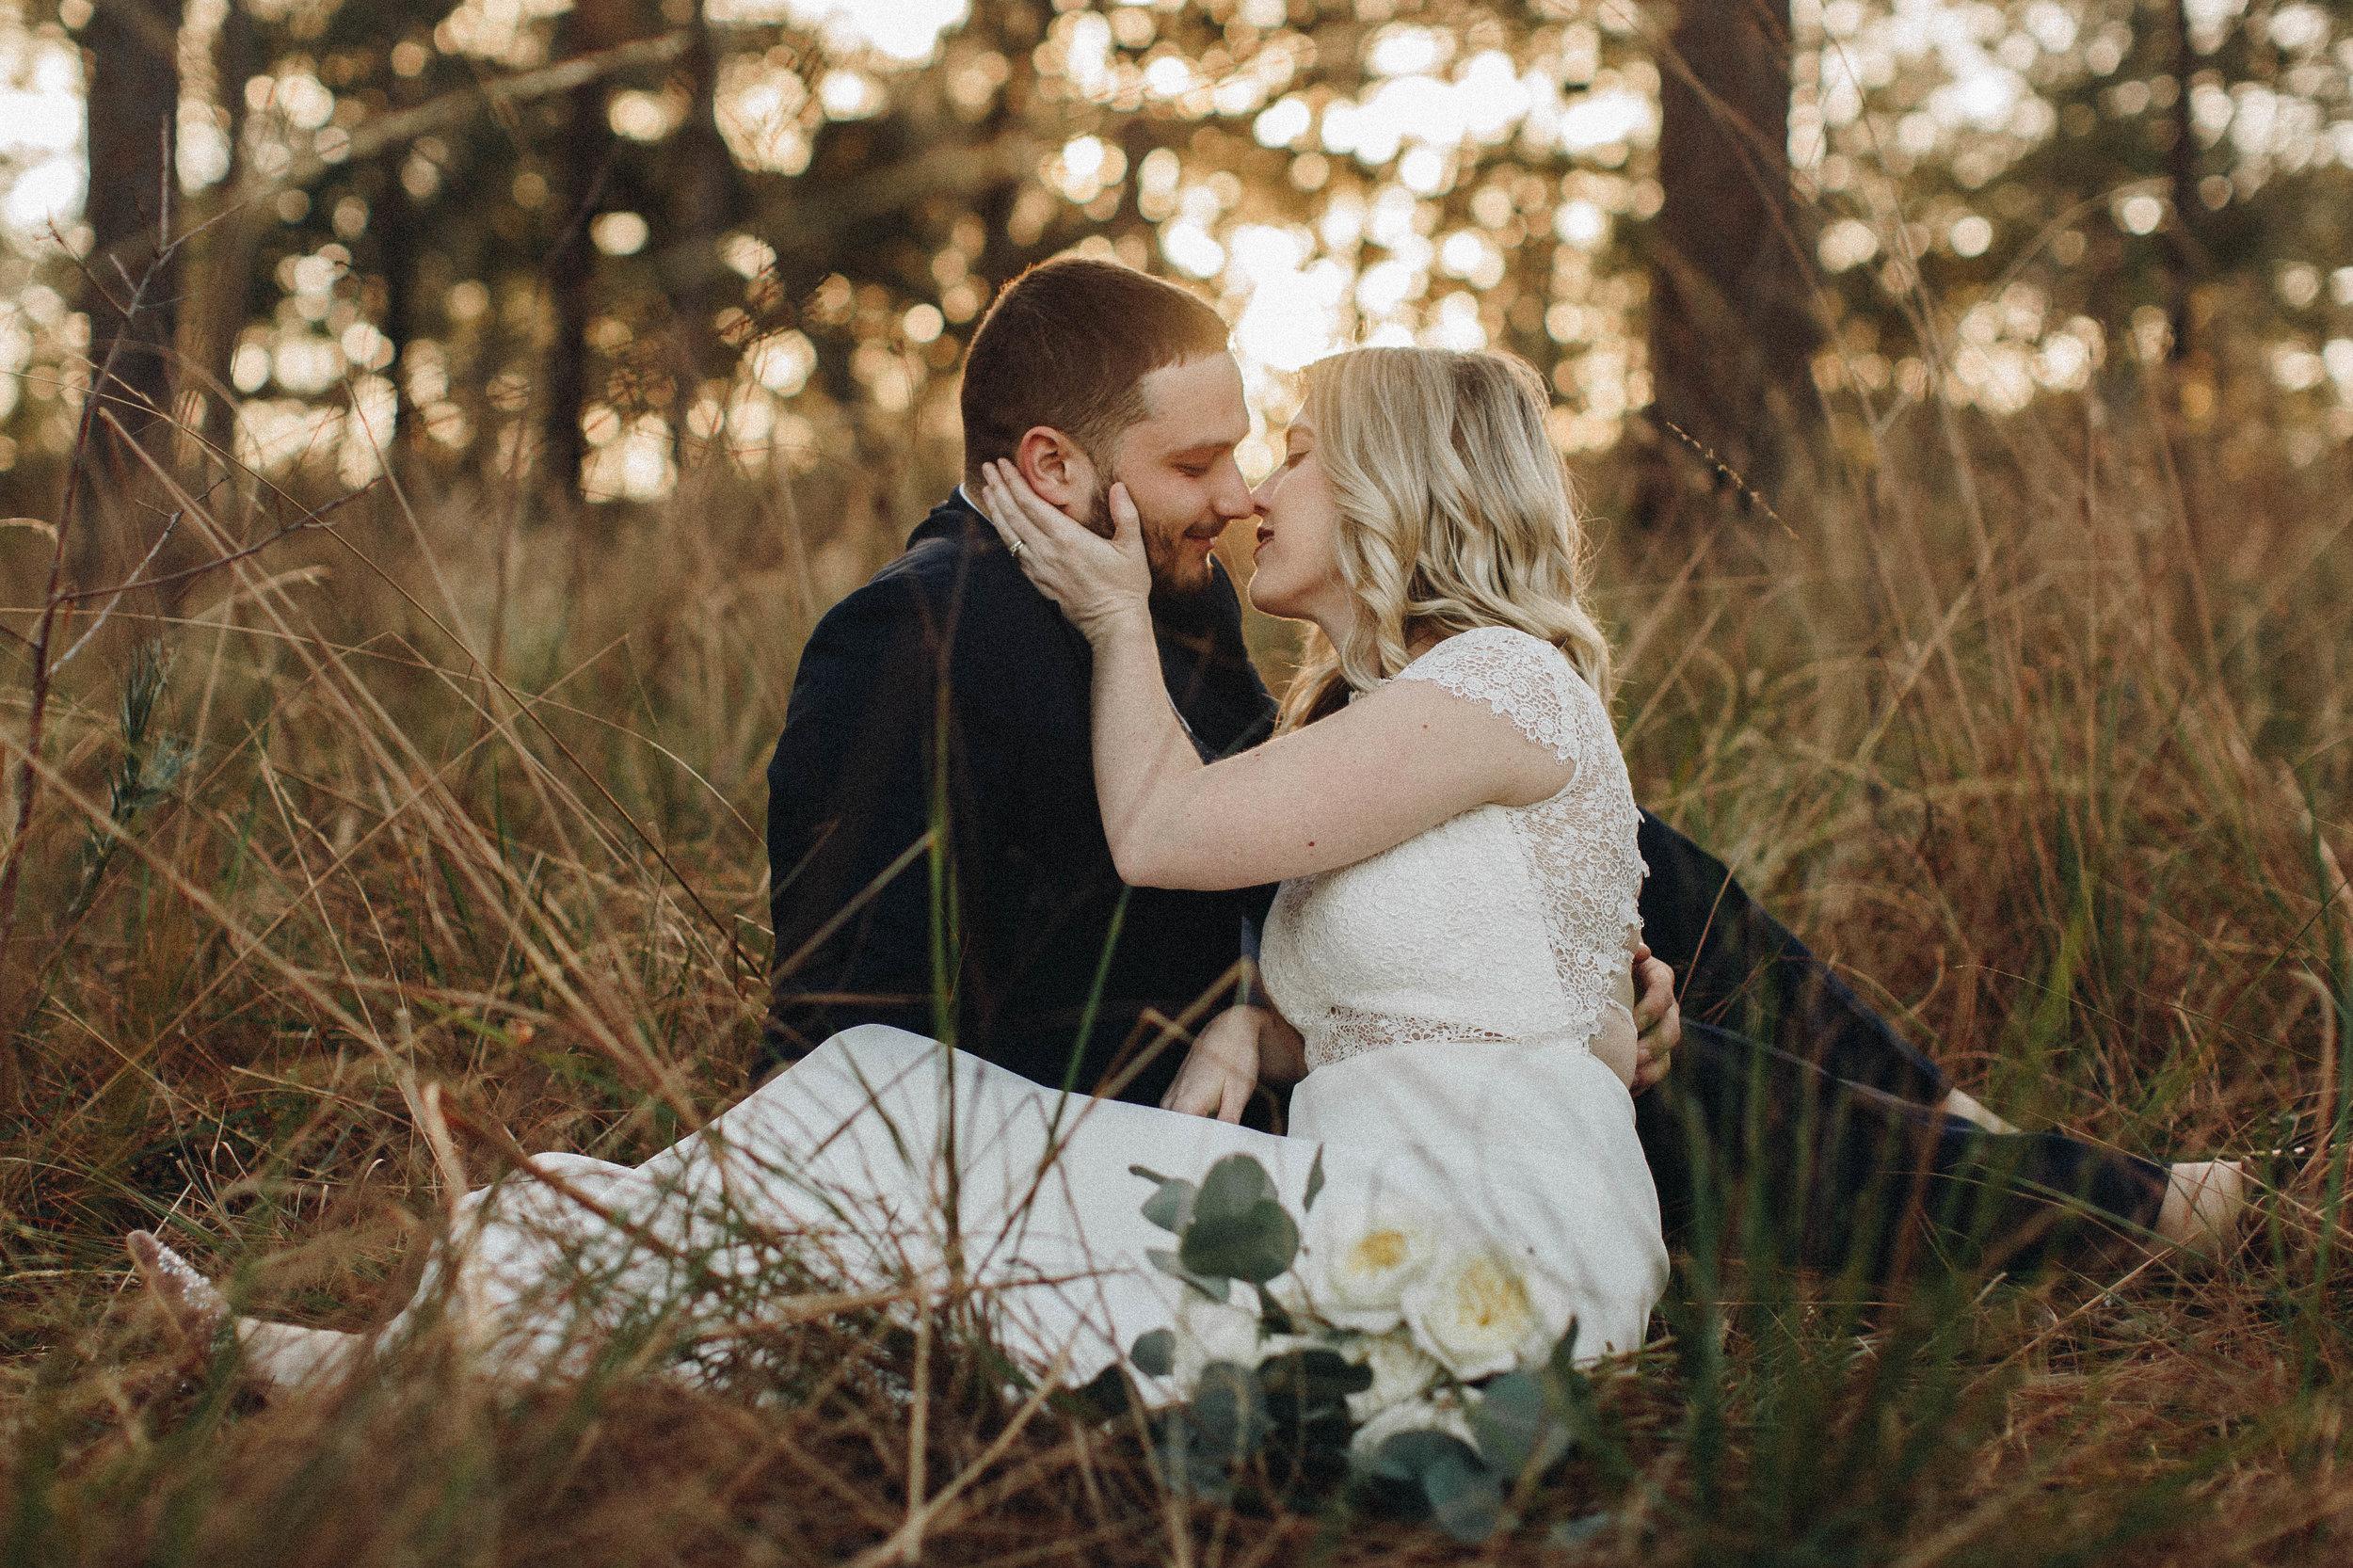 Orlando+wedding+photographer-21.jpeg